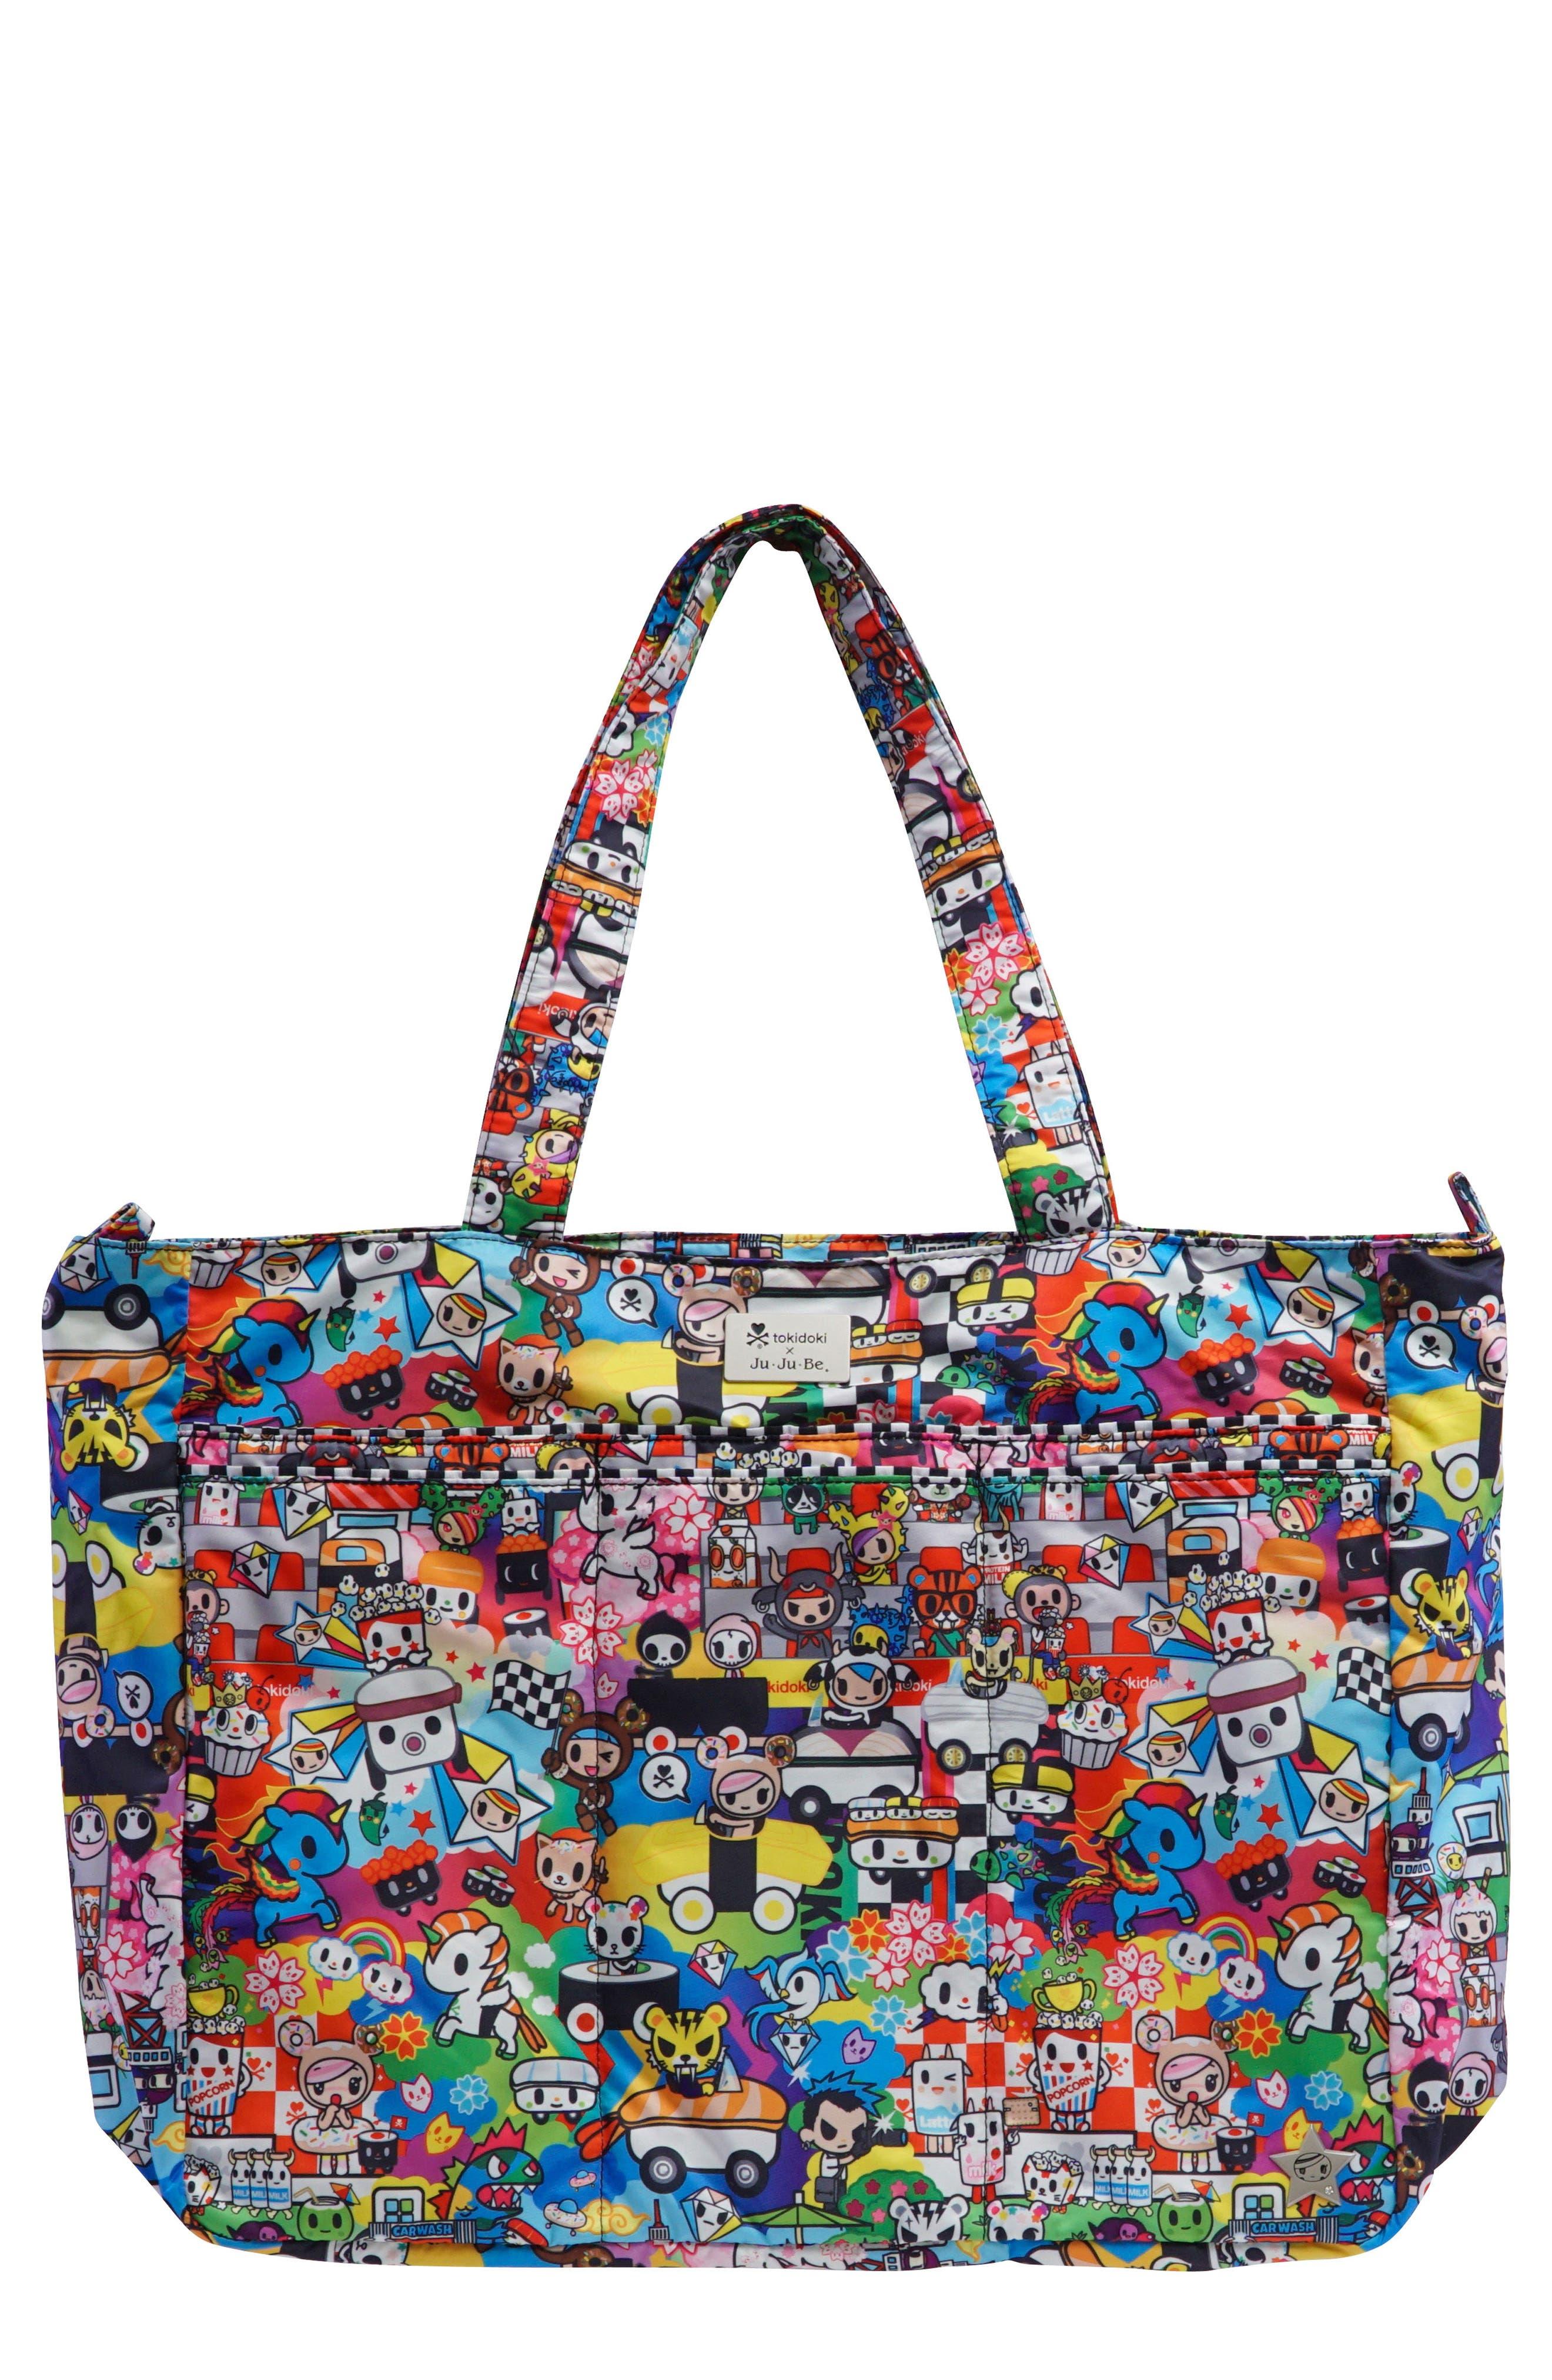 tokidoki x Ju-Ju-Be 'Super Be' Diaper Bag,                             Main thumbnail 1, color,                             SUSHI CARS